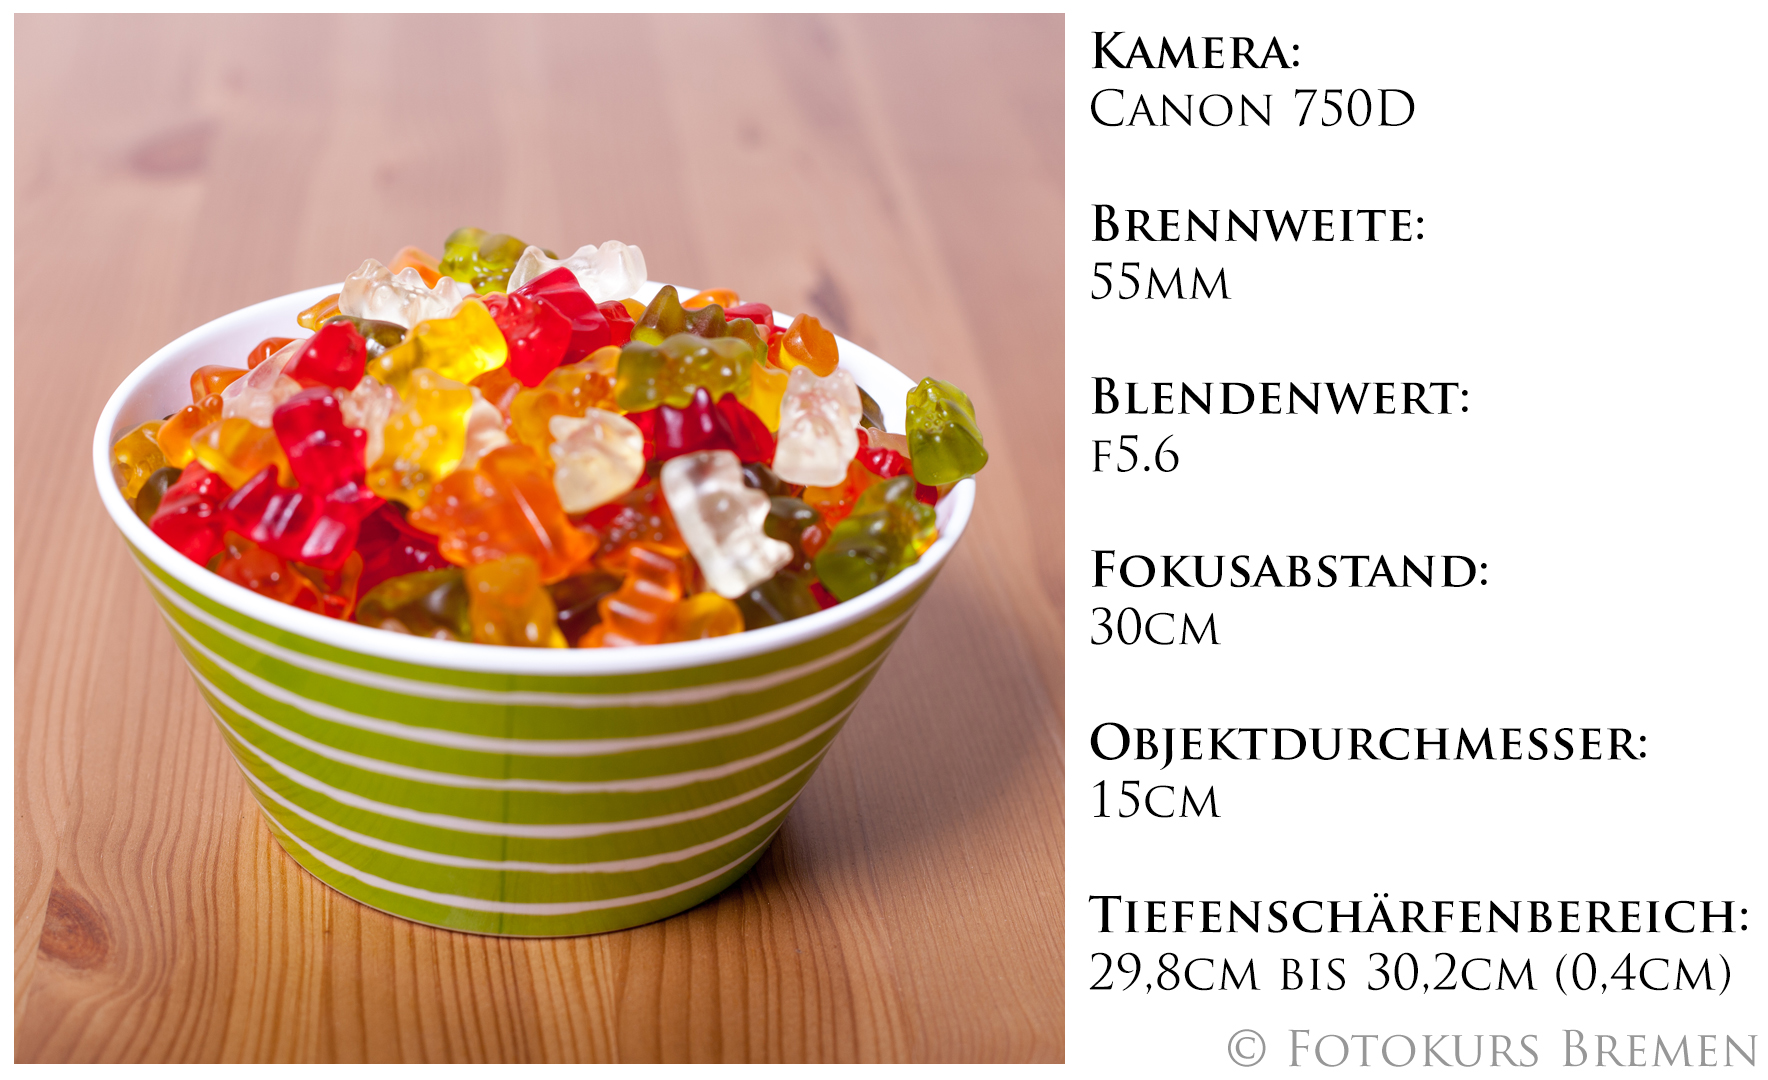 Foodfotografie, Fotokurs, Focus Stacking, Makrofotografie, Gummibärchen